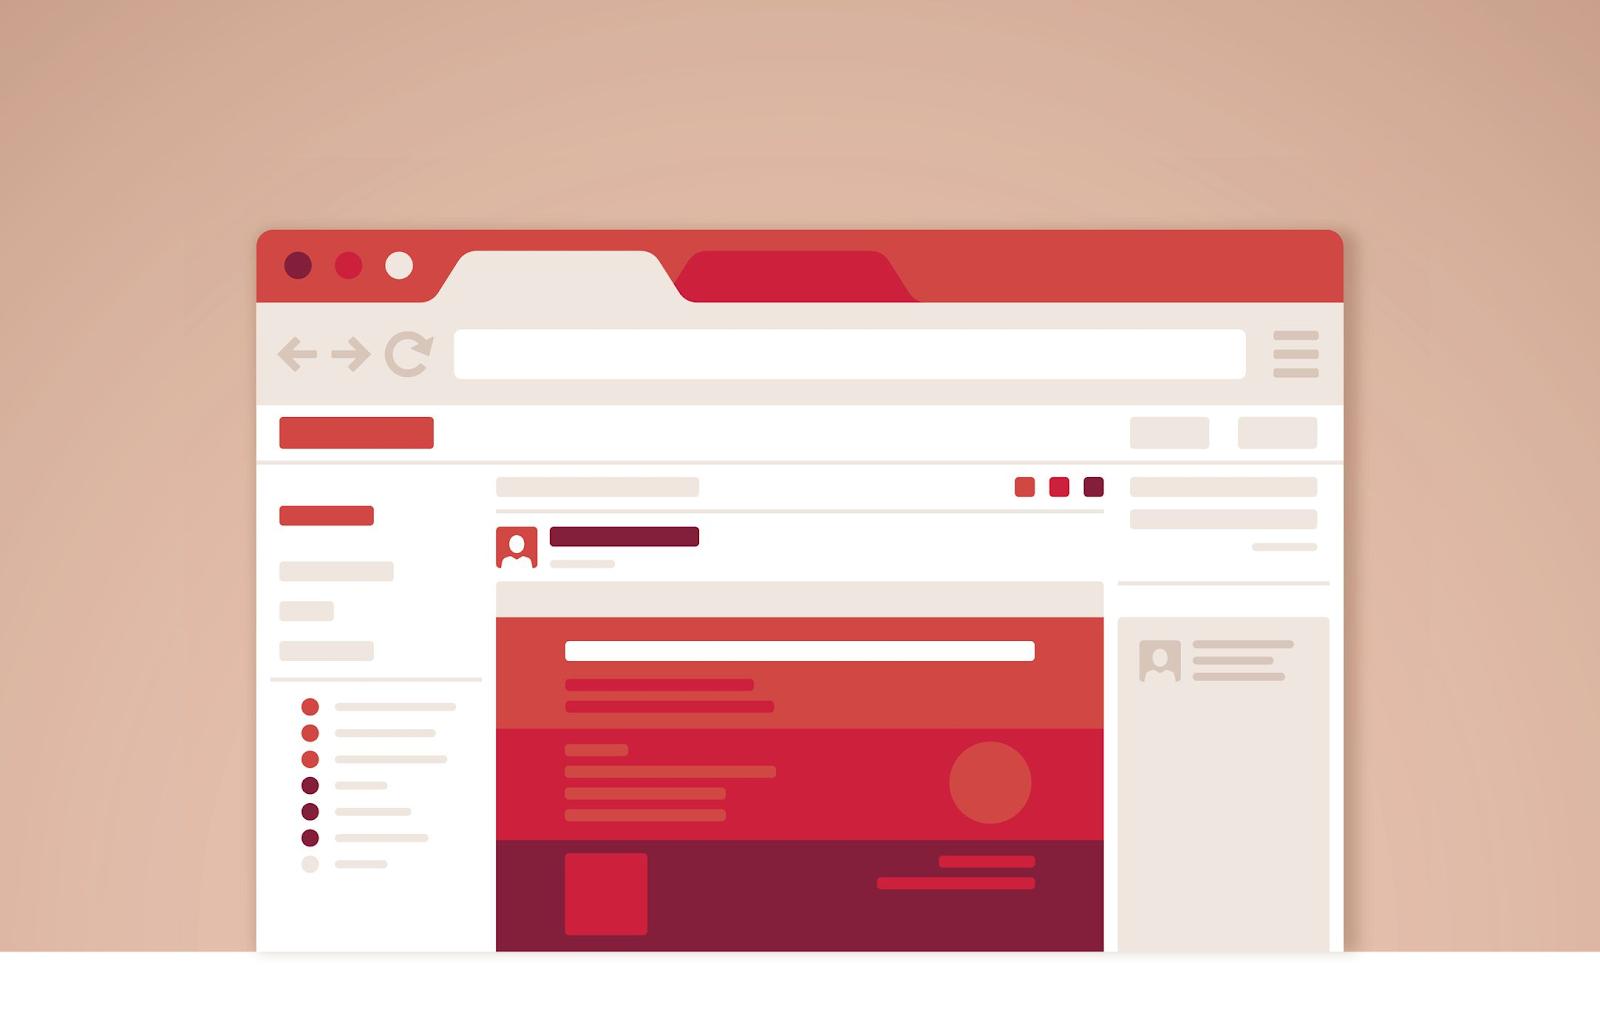 improve usability of website